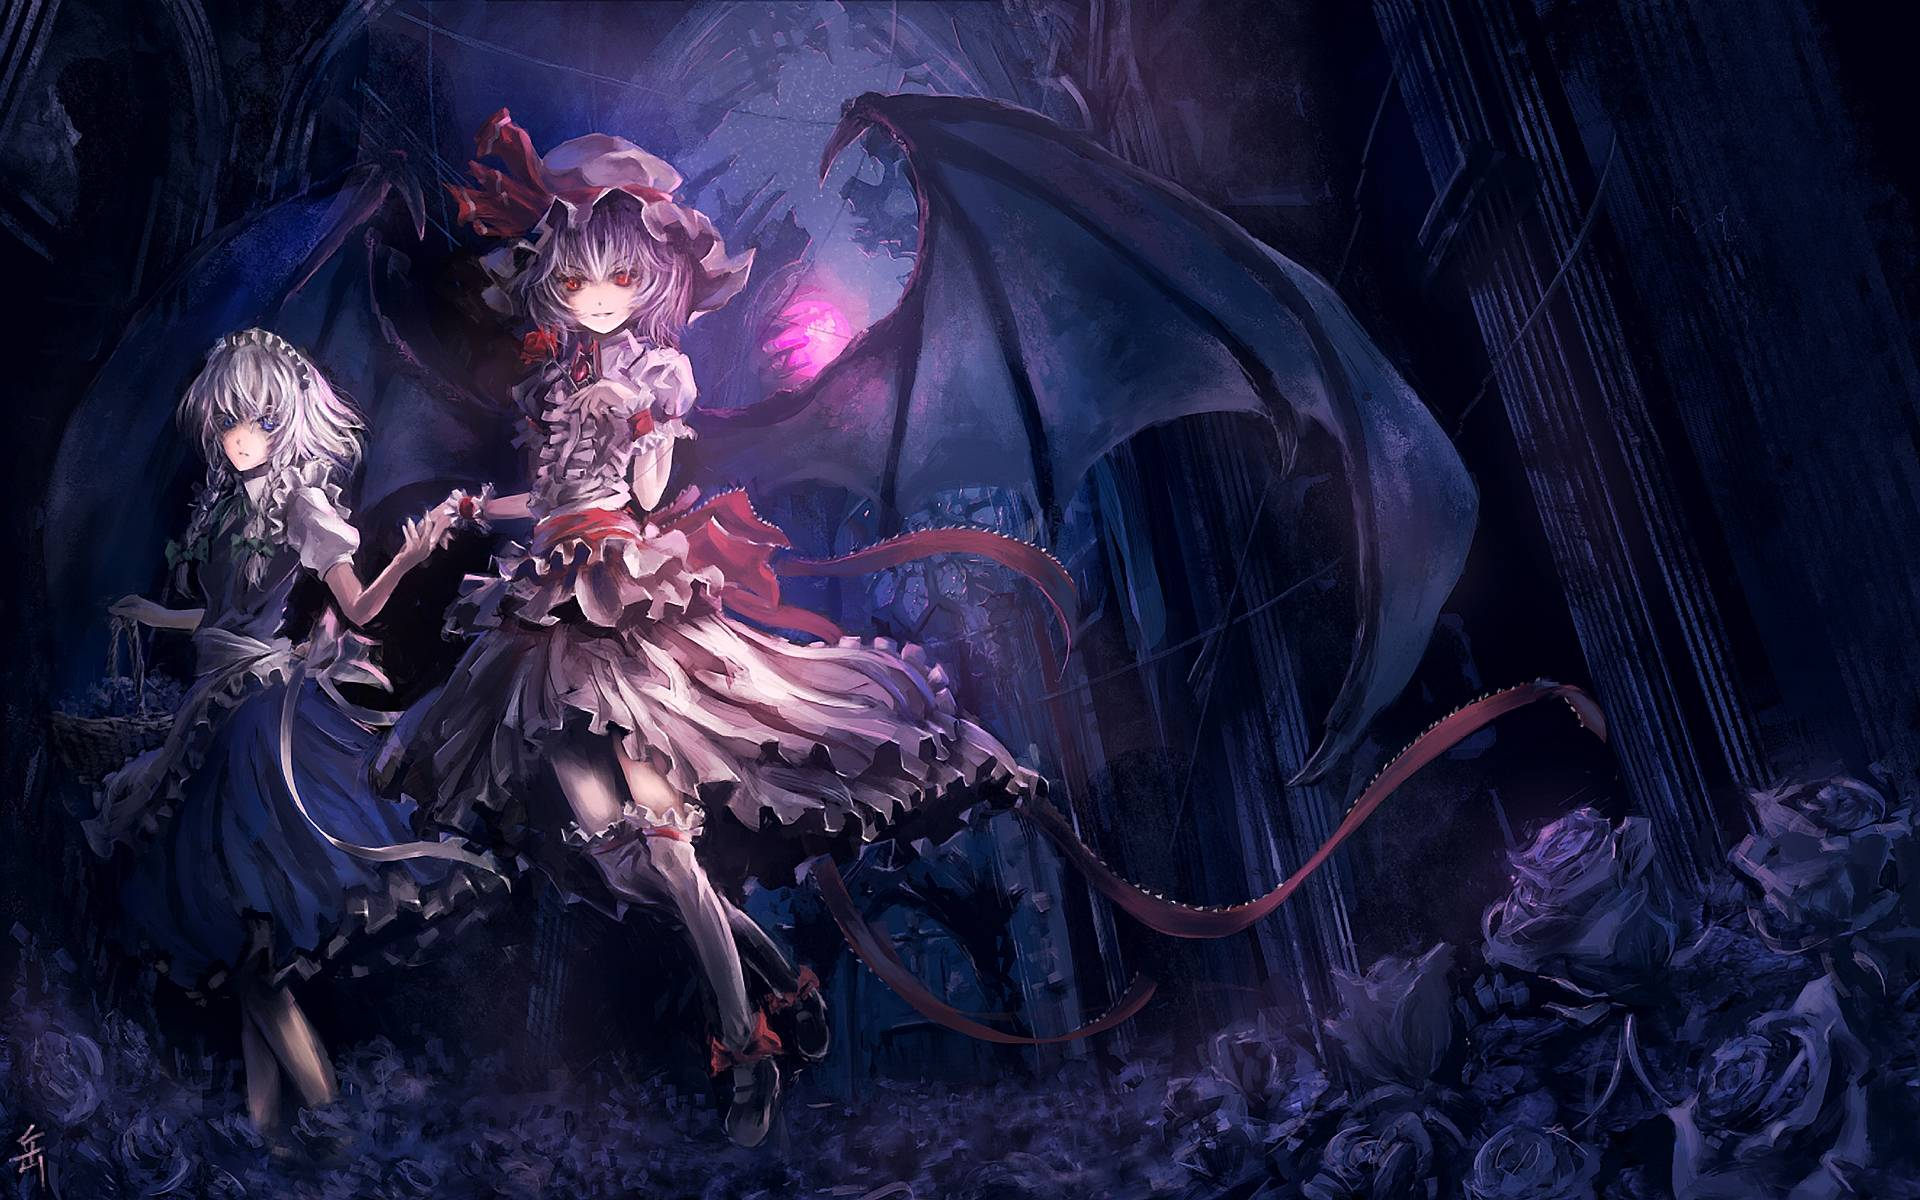 Dark Anime Wallpaper (49 Wallpapers) - Adorable Wallpapers